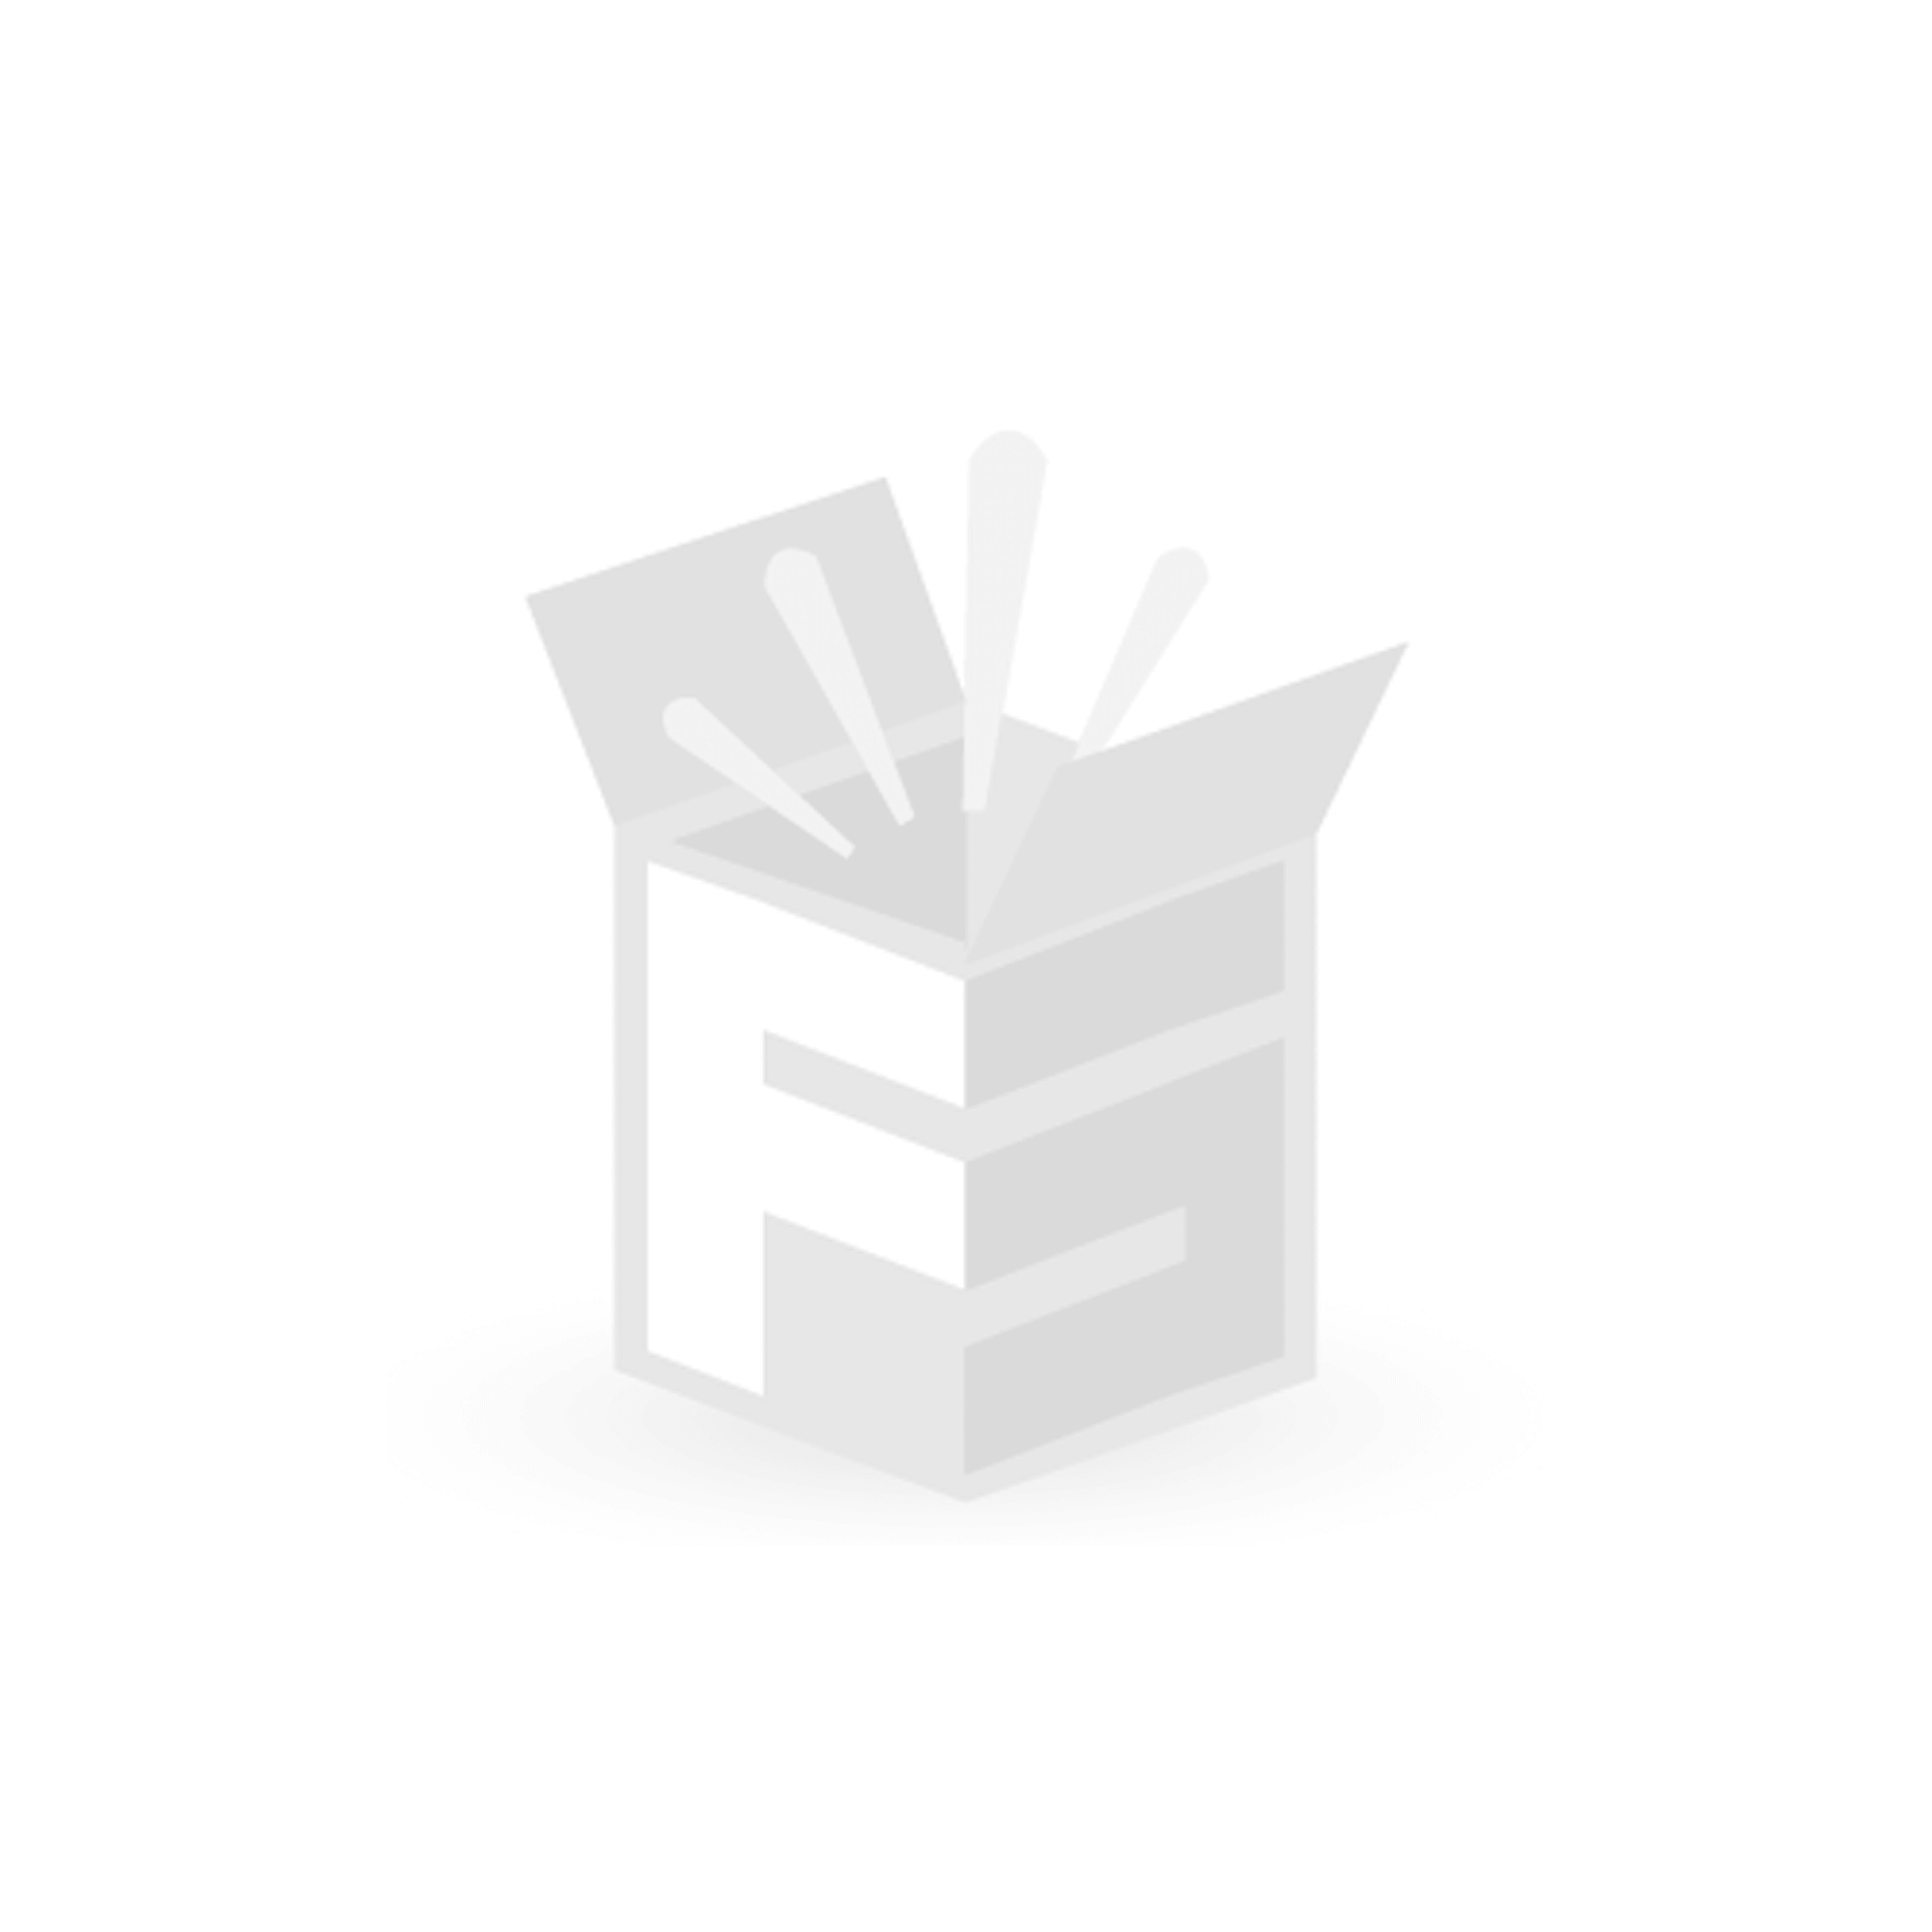 FS-STAR Fleisch Gewürzmischung 4-er Set